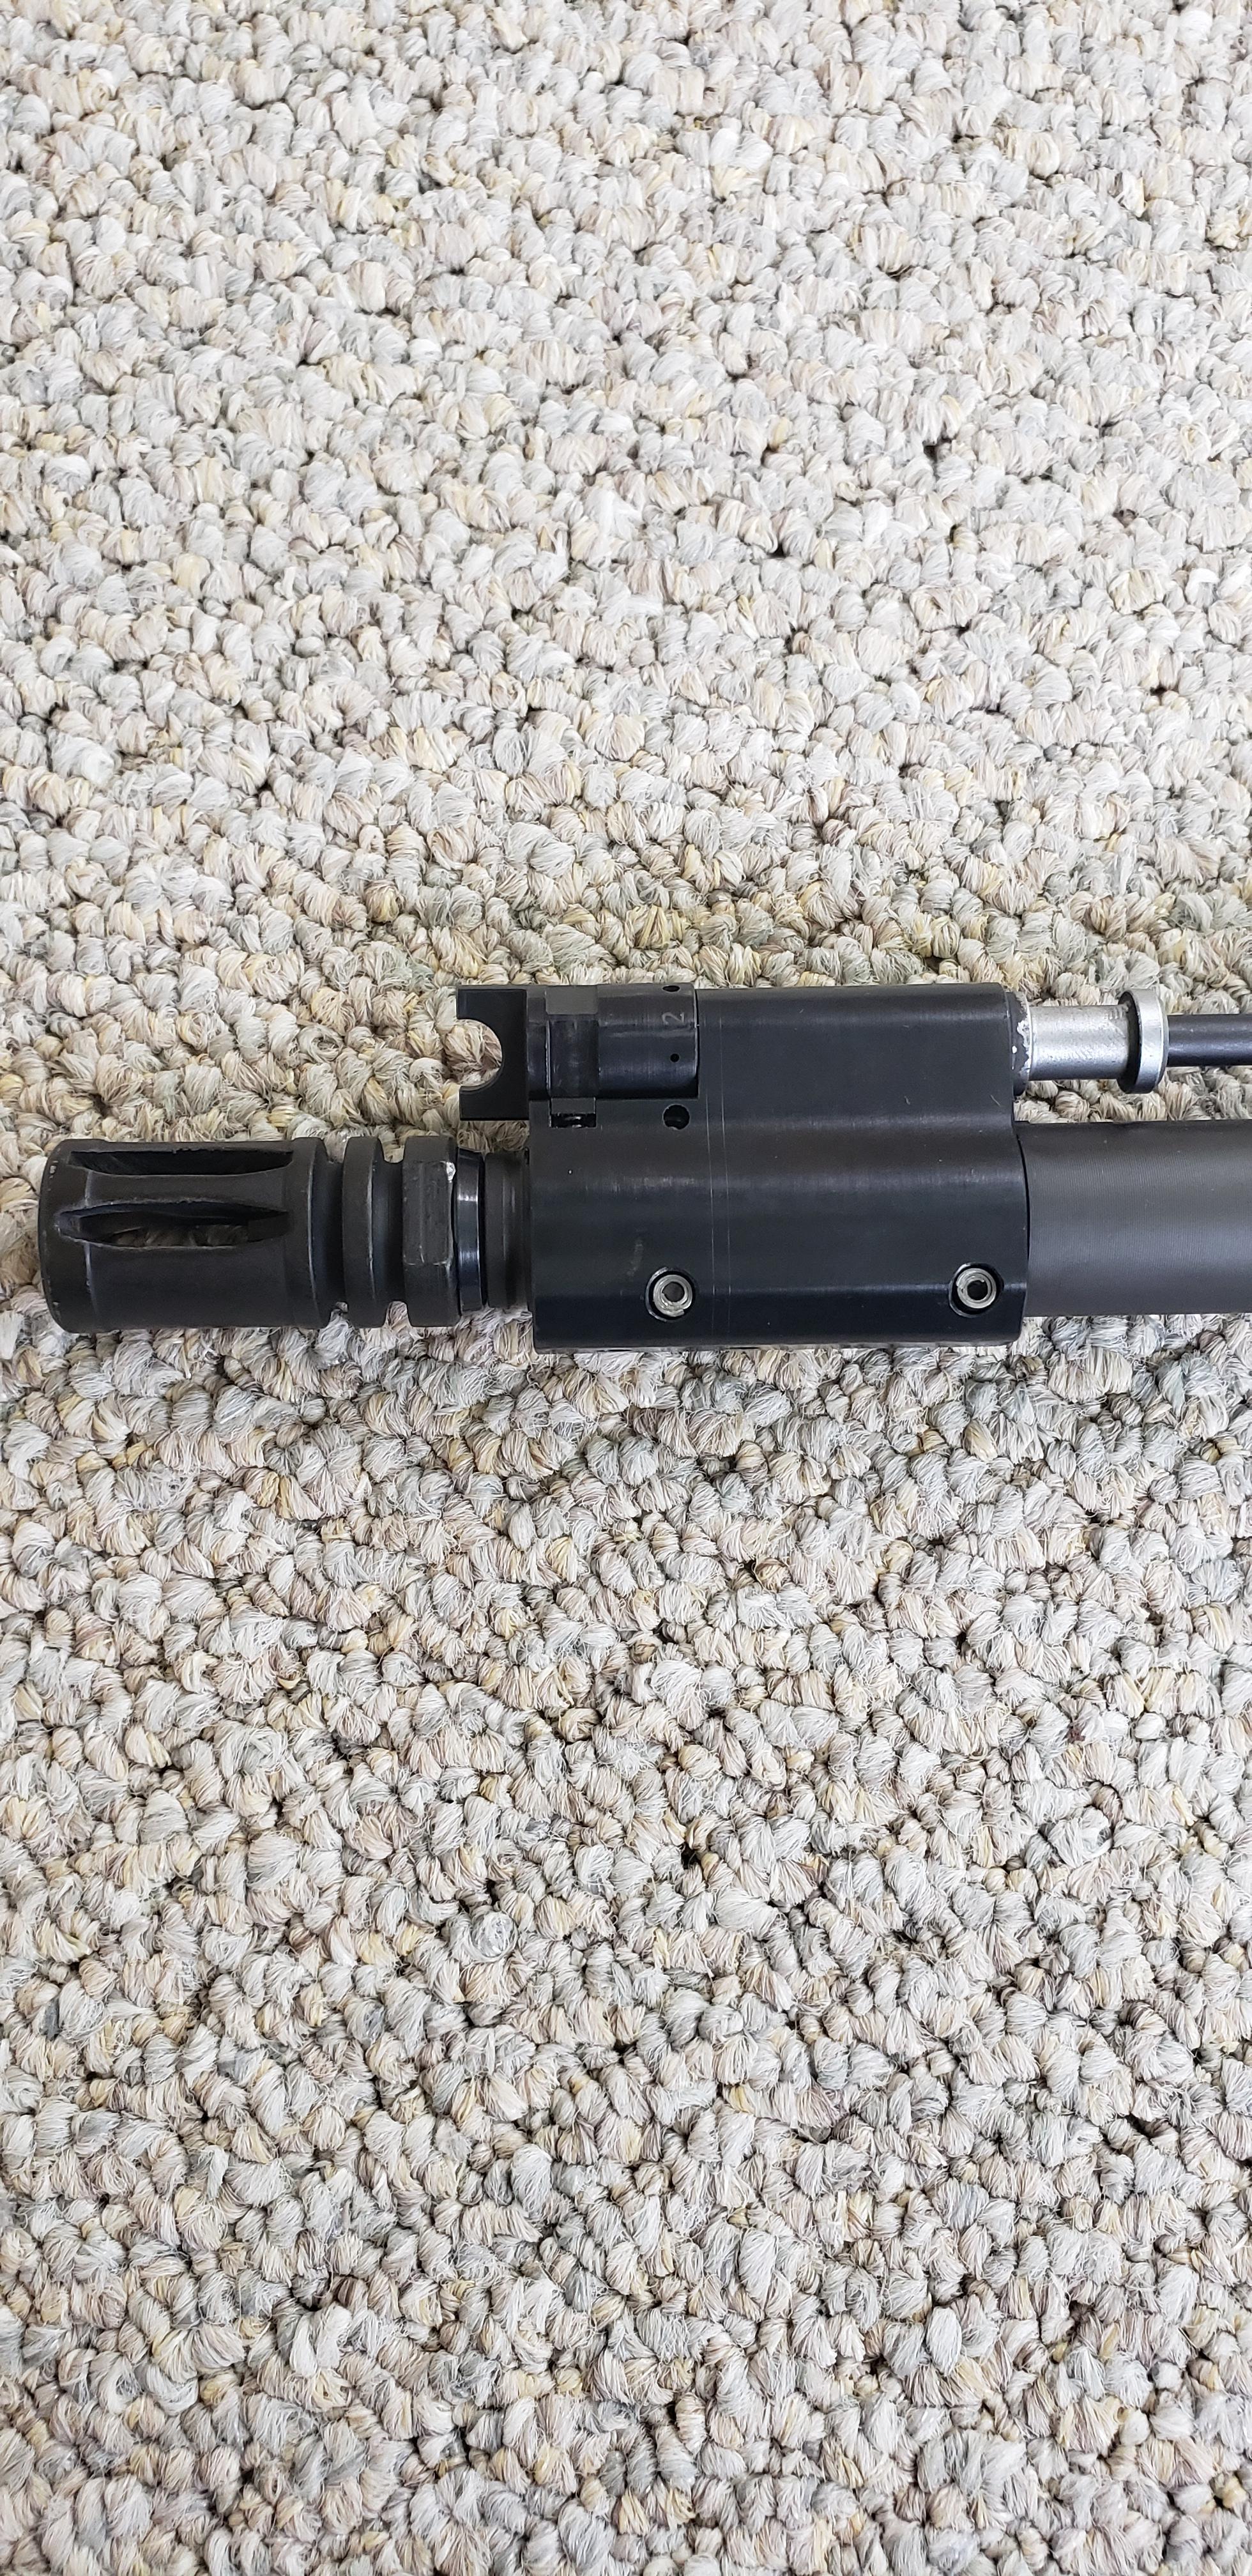 "MR223 11"" Waffen Burk AGB for HK416-m1nsdl5.jpg"